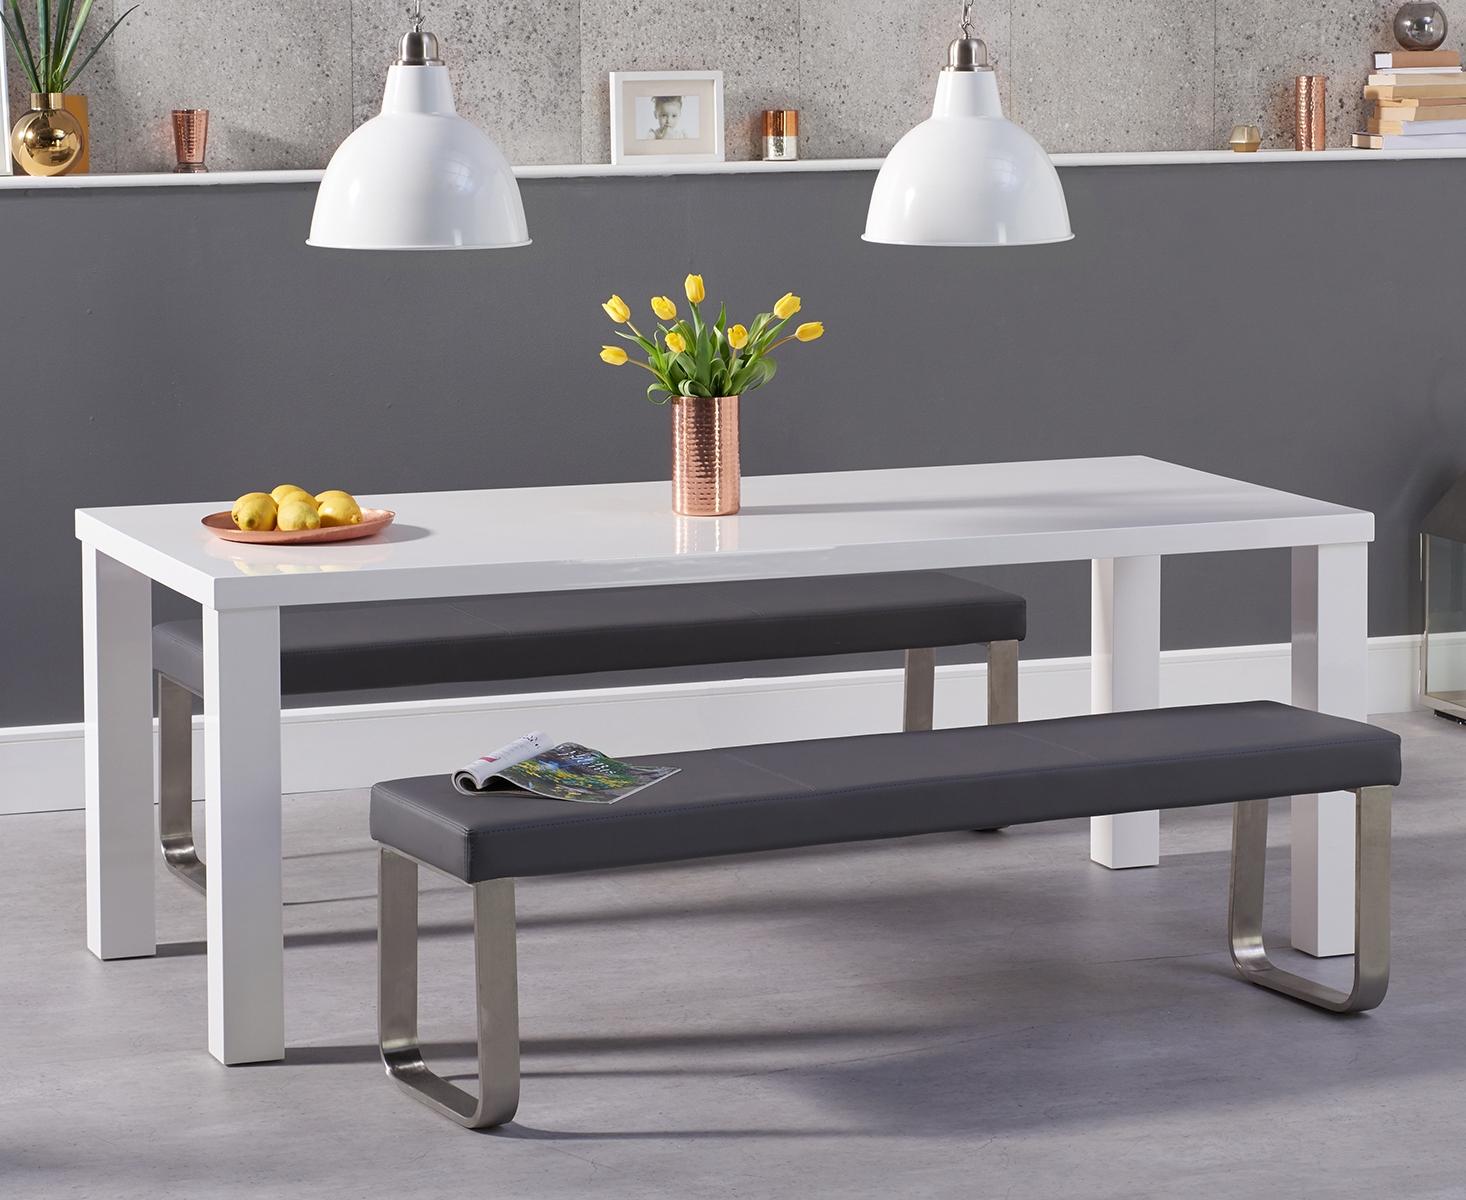 Merveilleux Oak Furniture Superstore